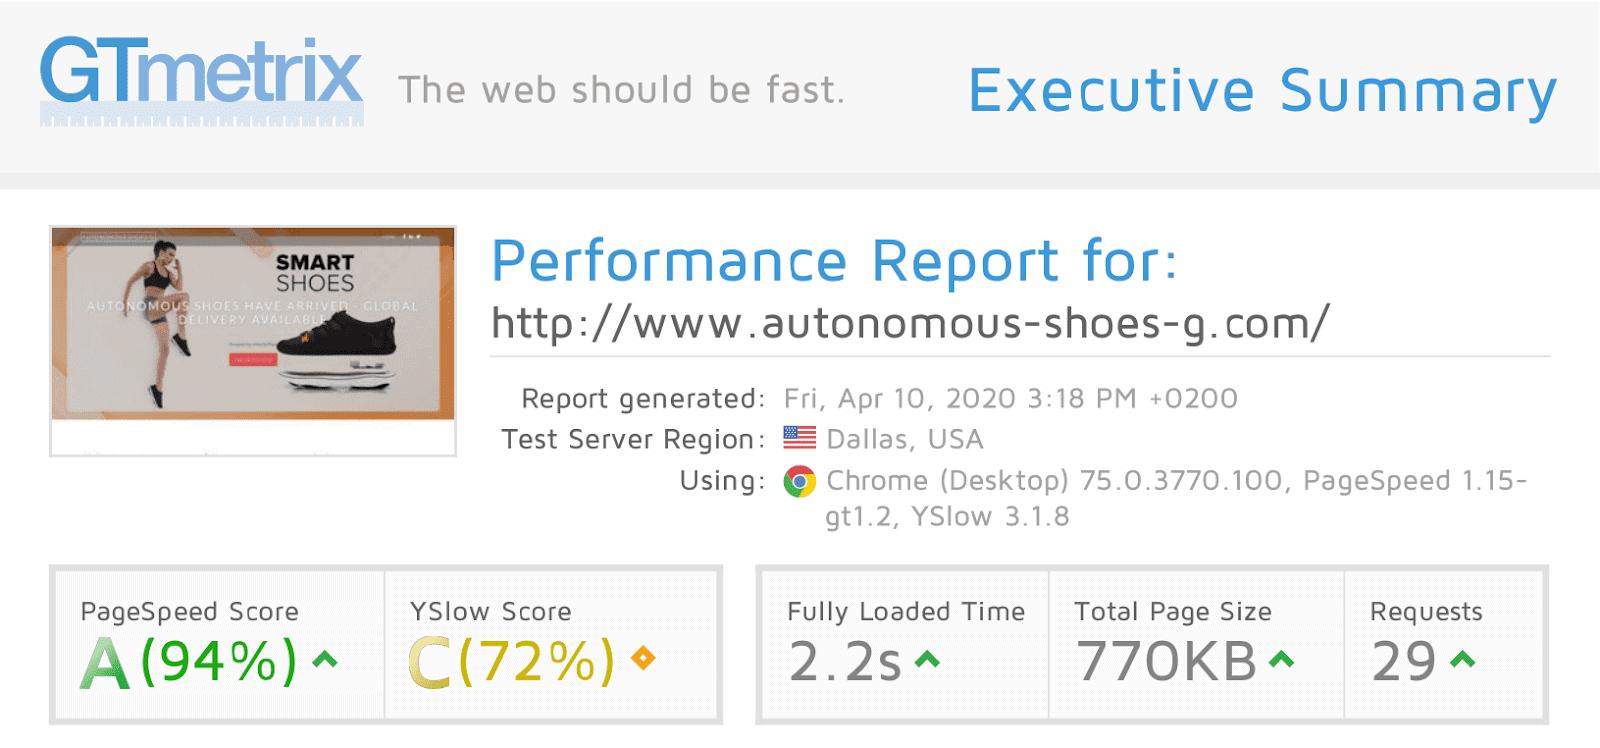 GoDaddy's GTmetrix test results